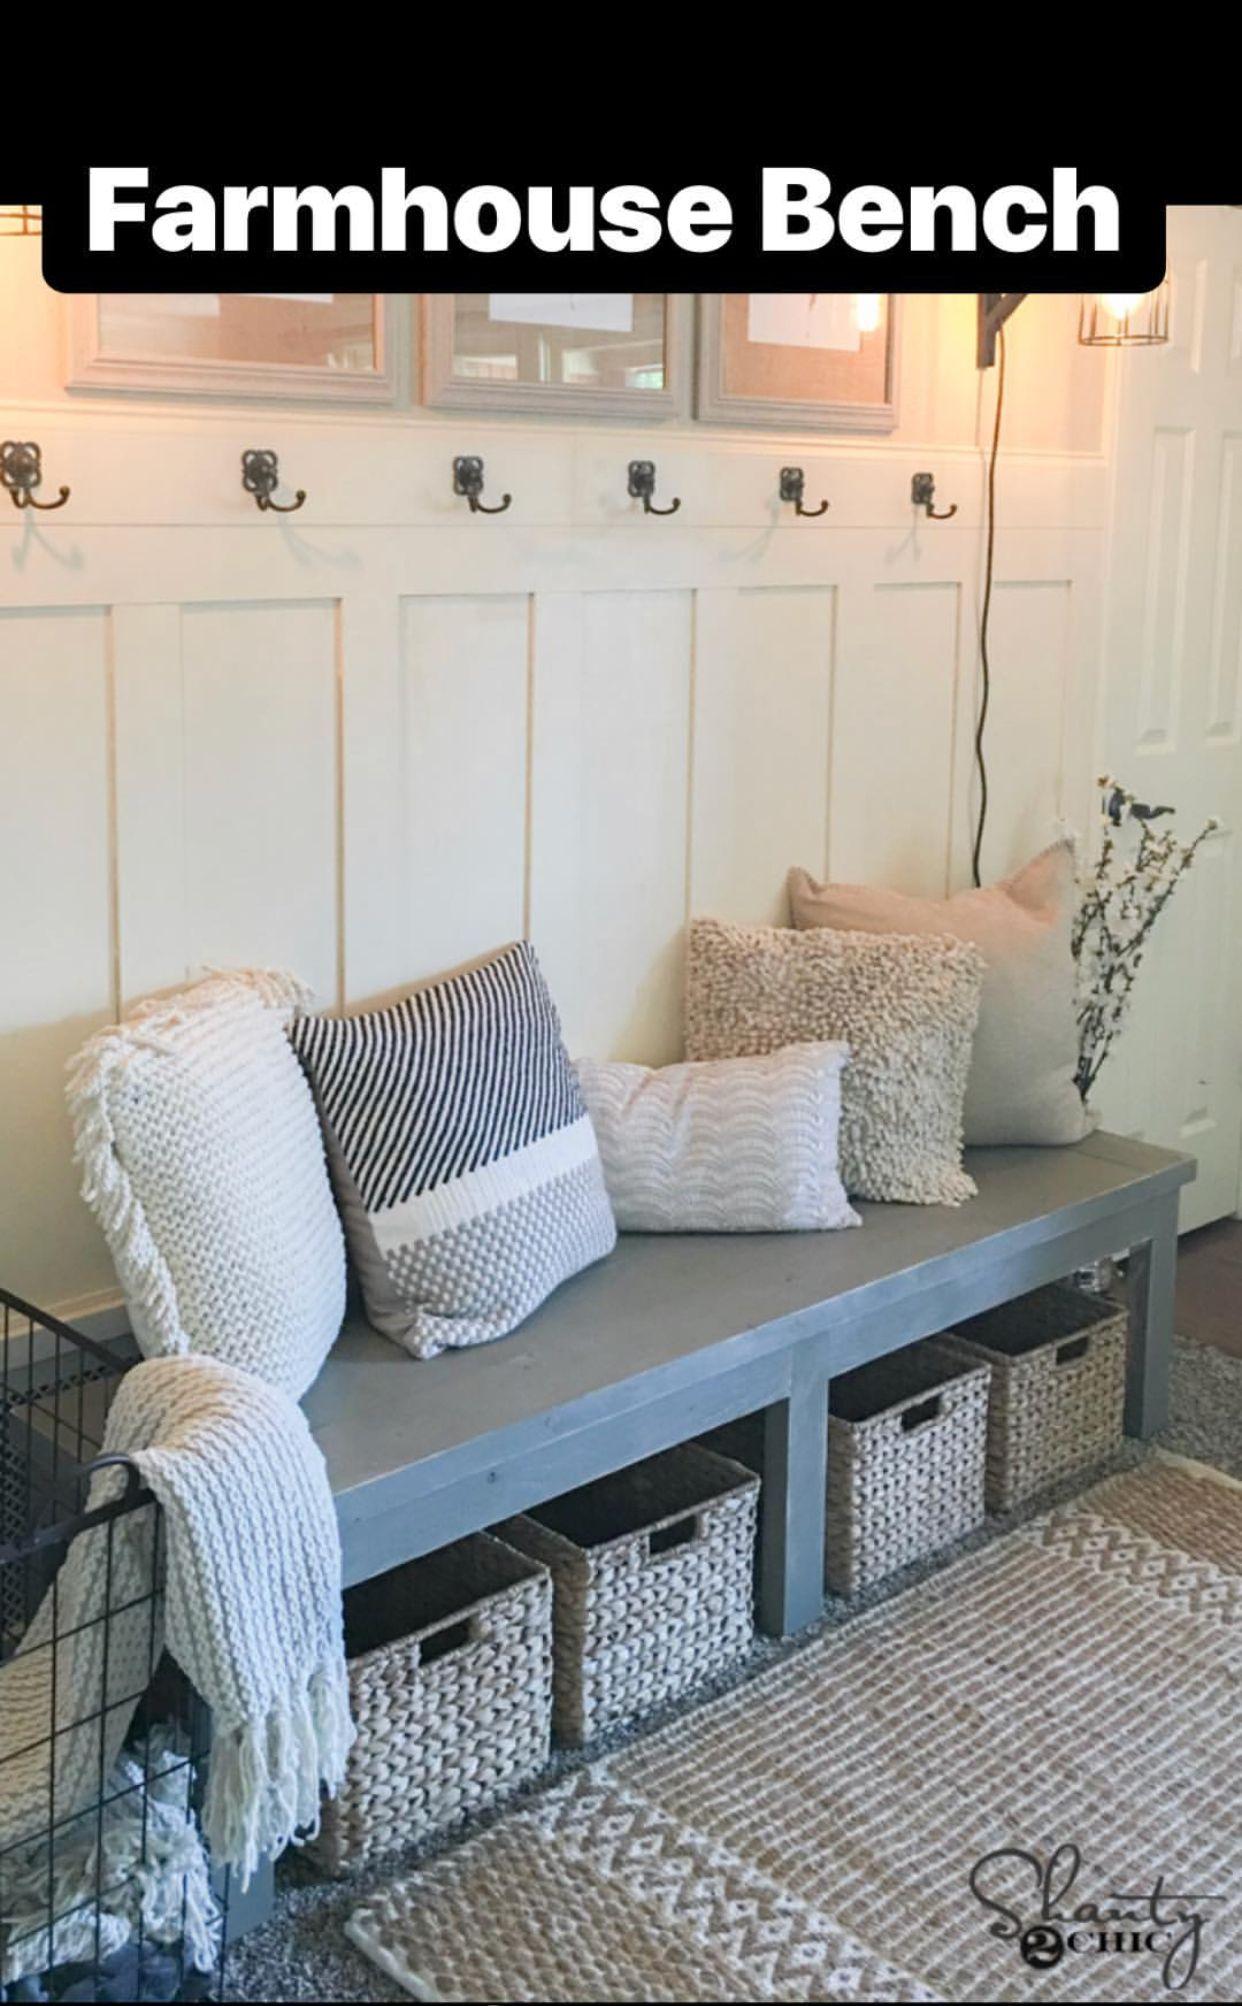 Hallway floor decor  Pin by Elfa Silvestre on dormitorio  Pinterest  Home House and